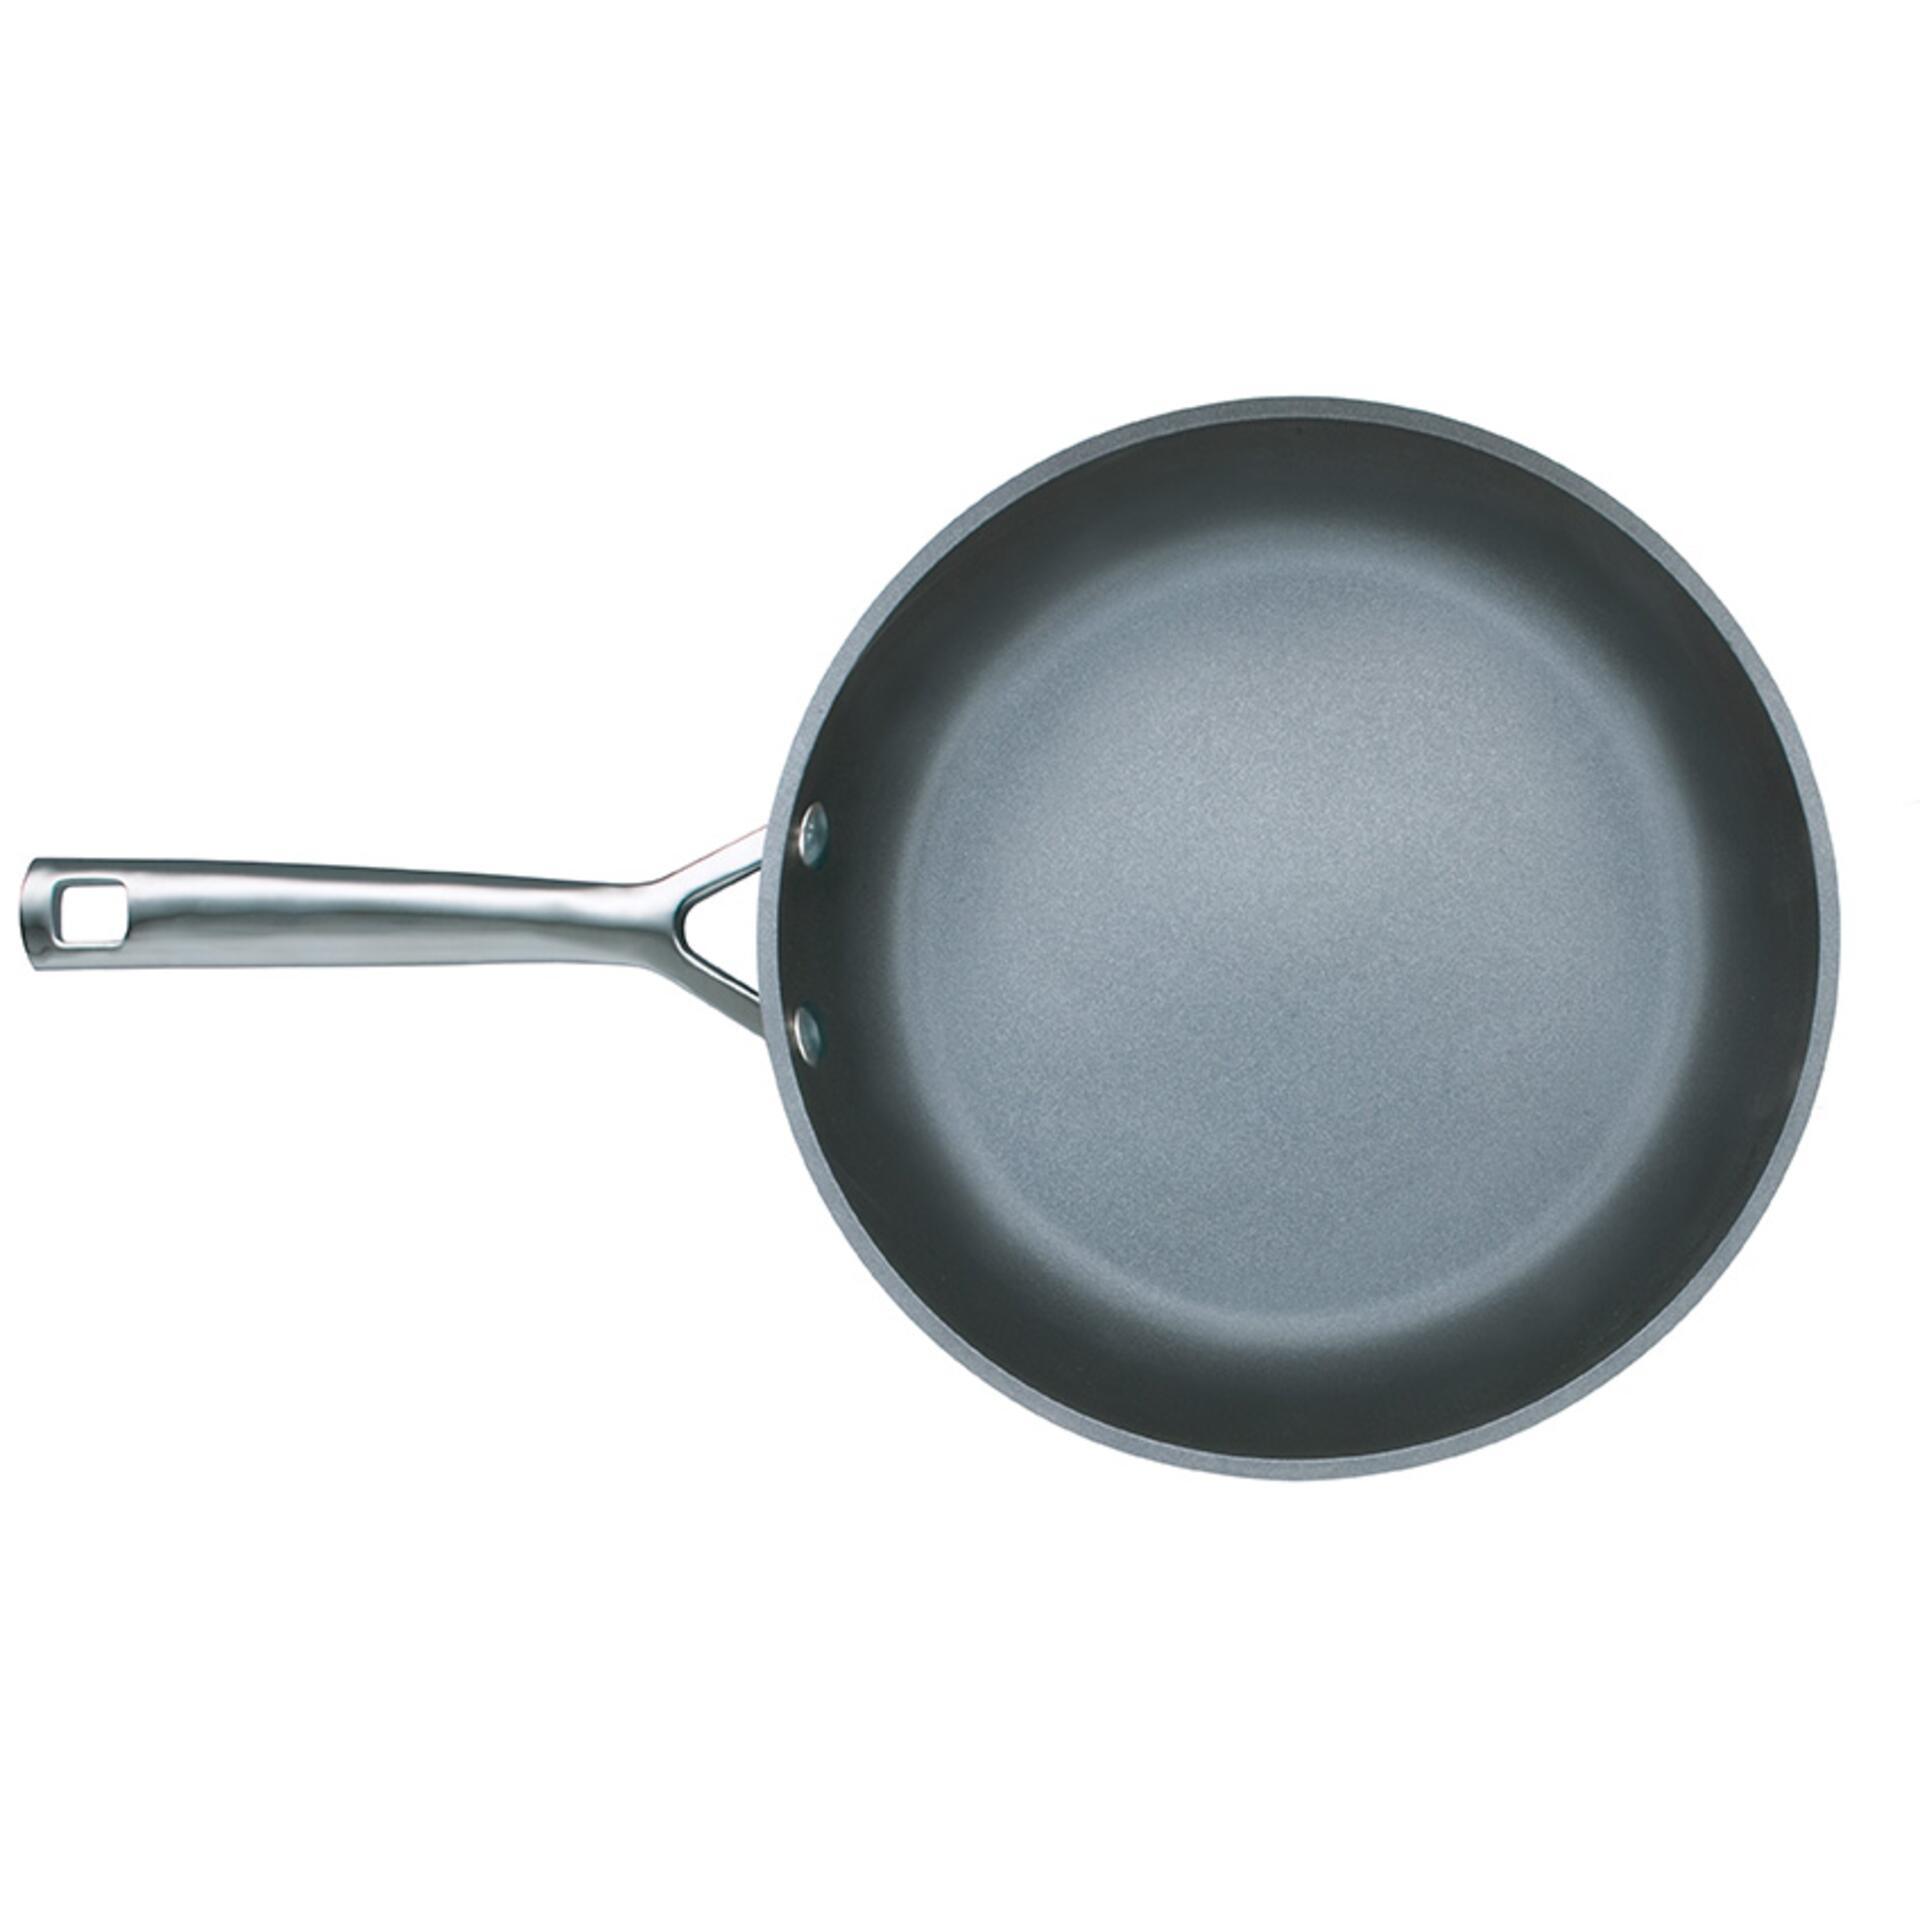 Le Creuset Alu Pfanne Flach 30 cm